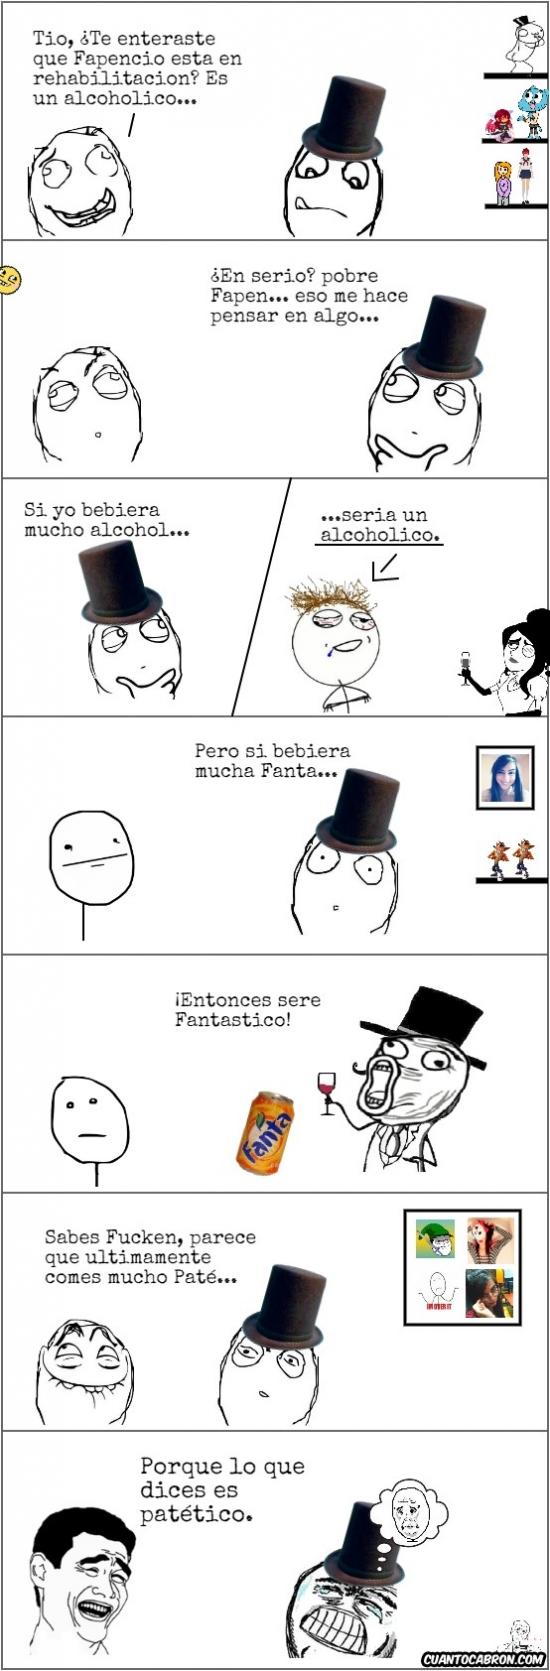 True_story - ¿Fantástico? Casi...